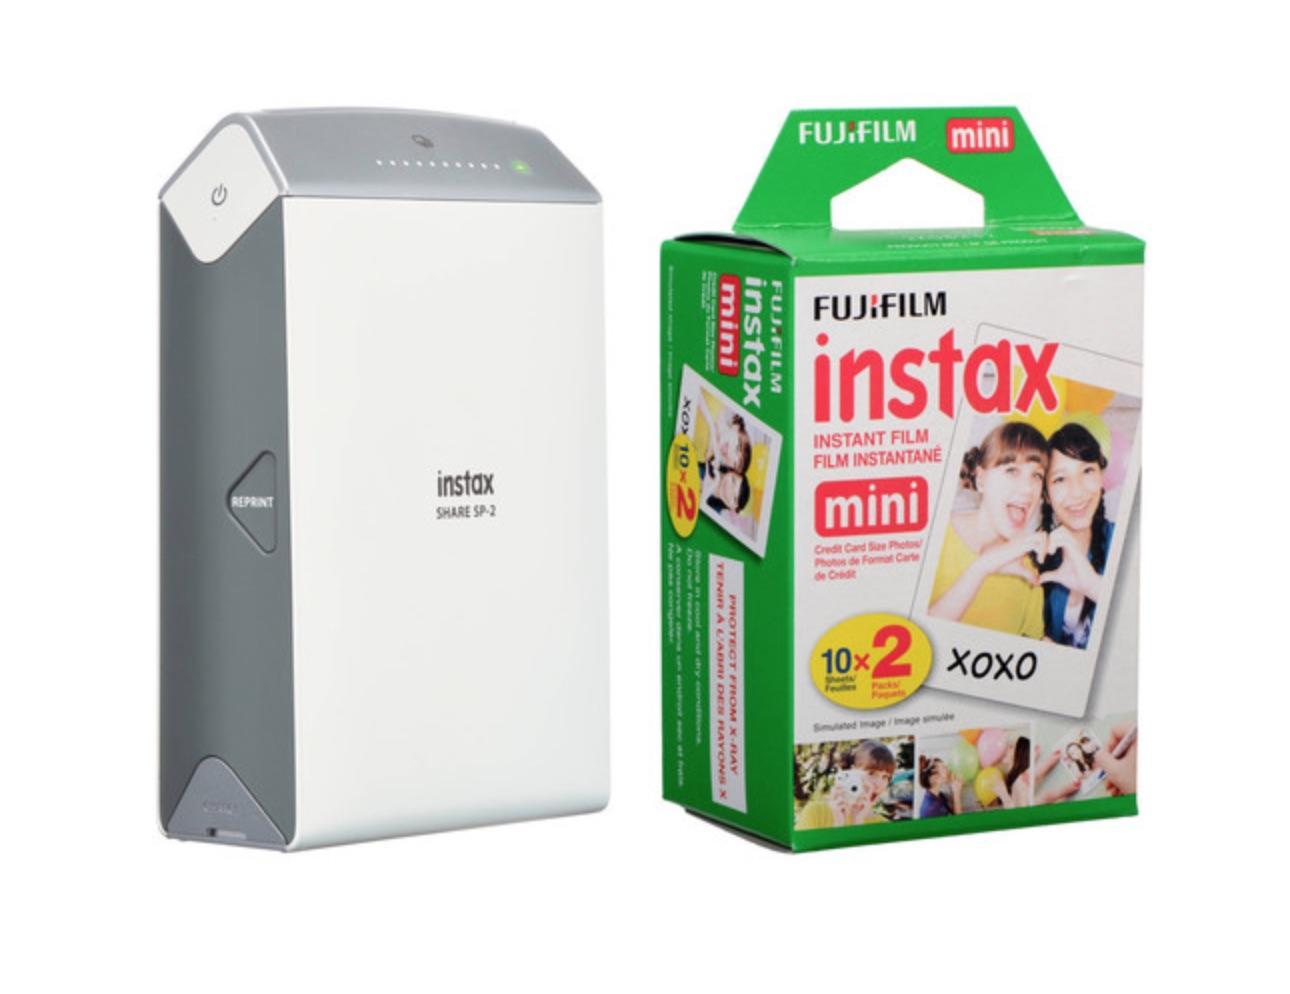 http://thedigitalstory.com/2019/11/26/Fujifilm-Printer.jpg